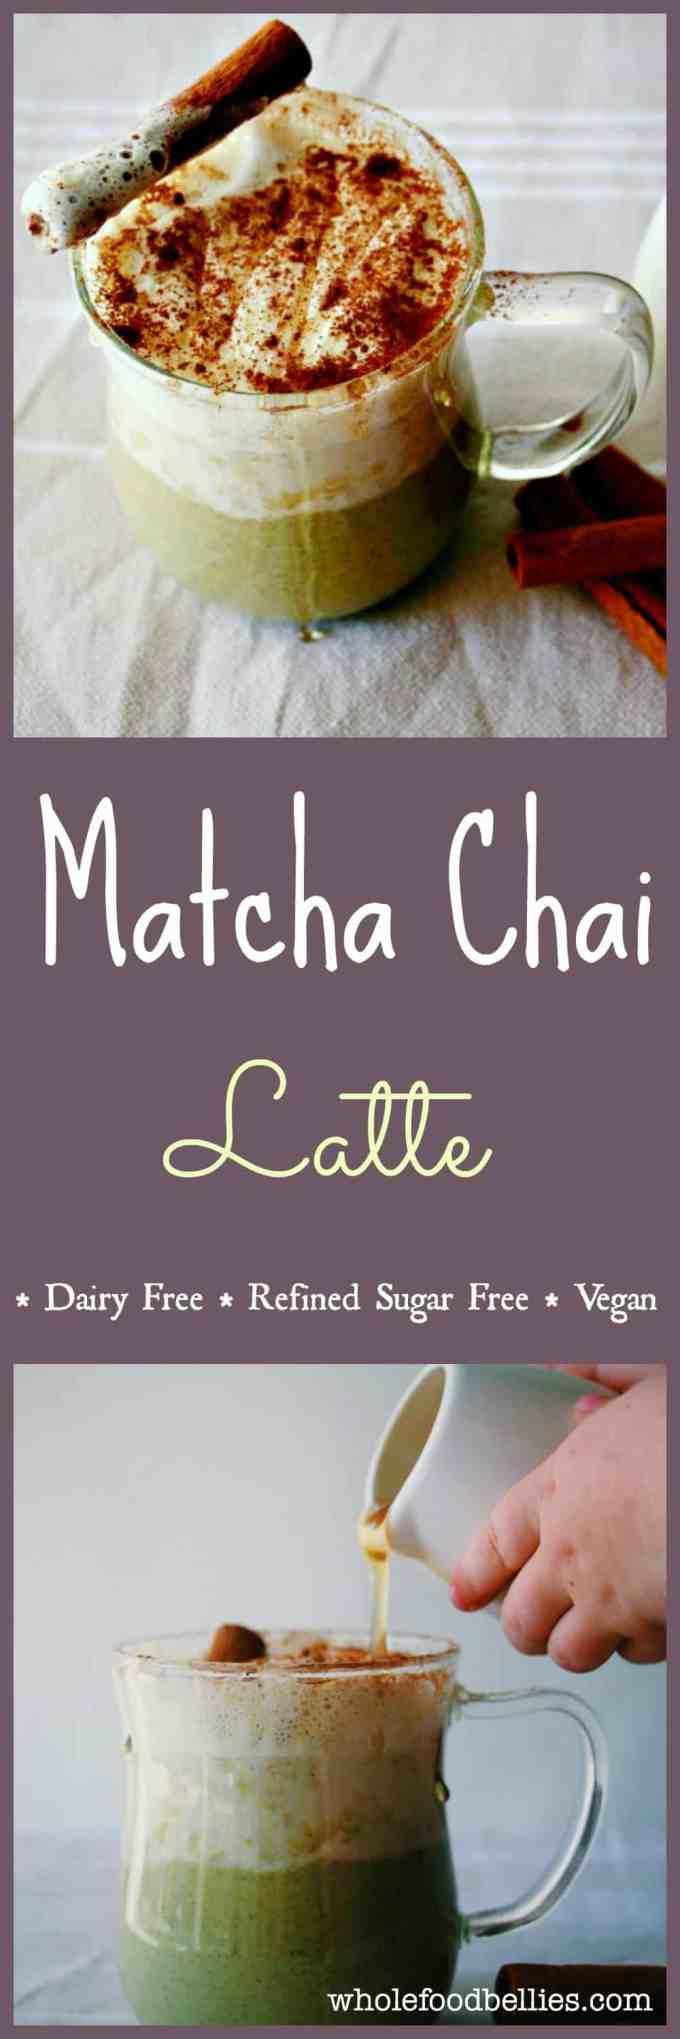 Matcha Chai Latte. Super creamy and delicious #vegan drink #refinedsugarfree and perfect for a comforting winter treat. #cinnamon #matcha